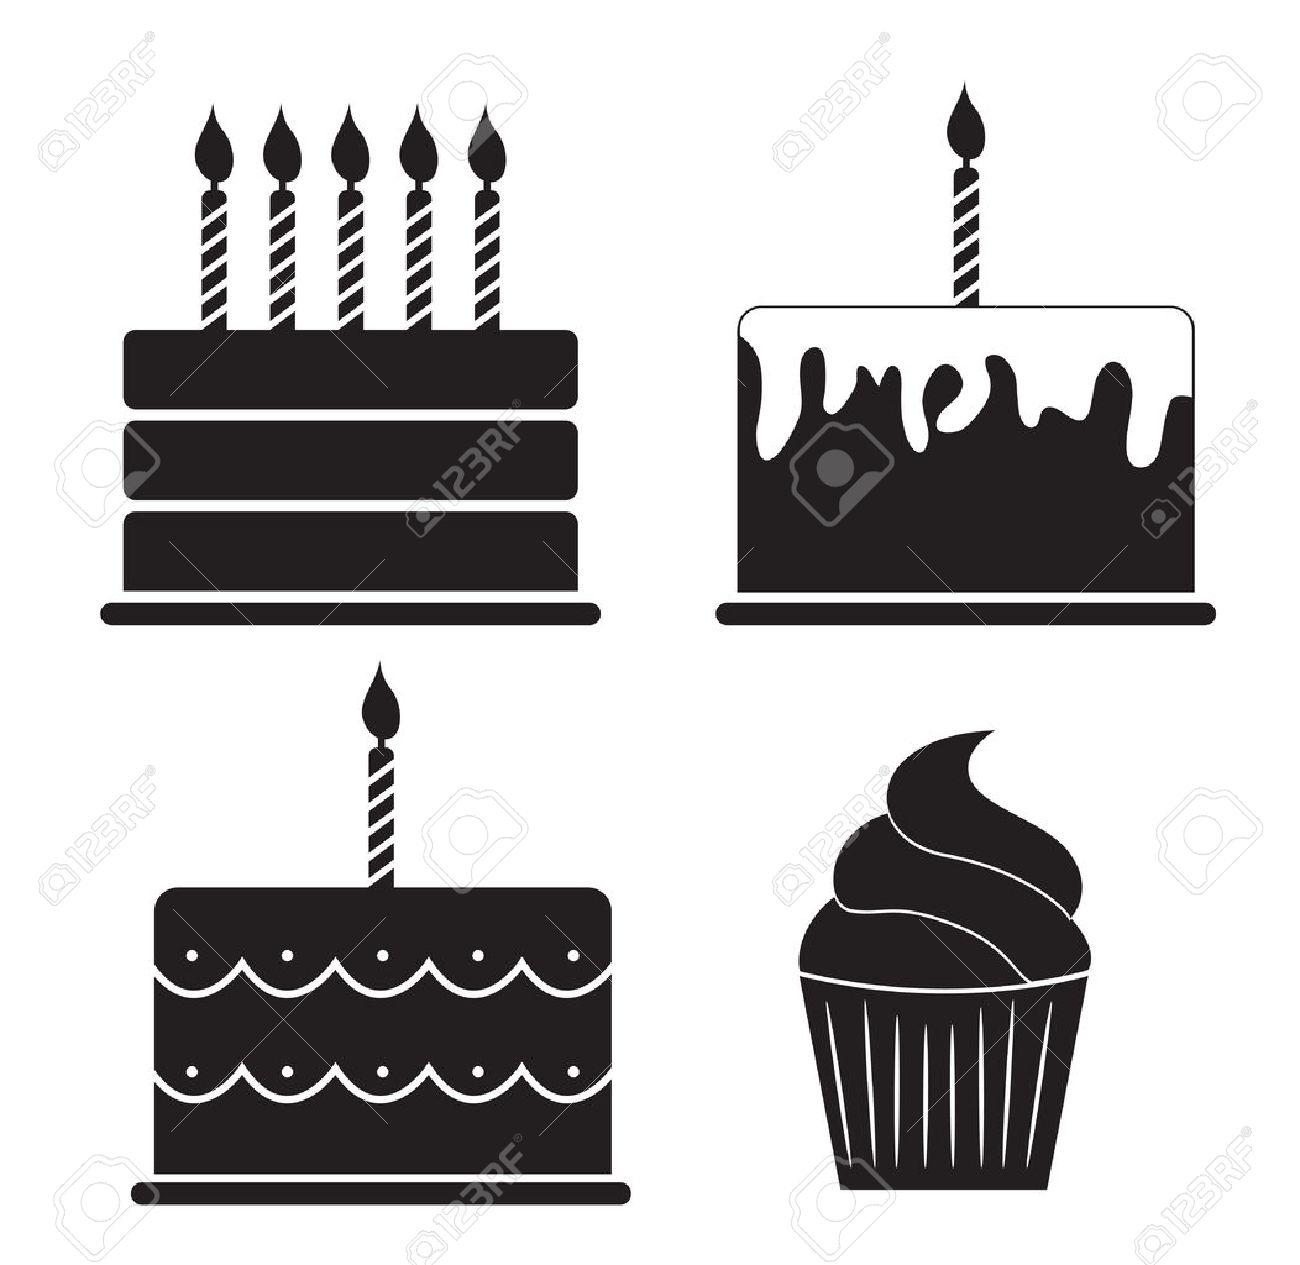 Birthday Cake Silhouette Set Vector Illustration Royalty Free.